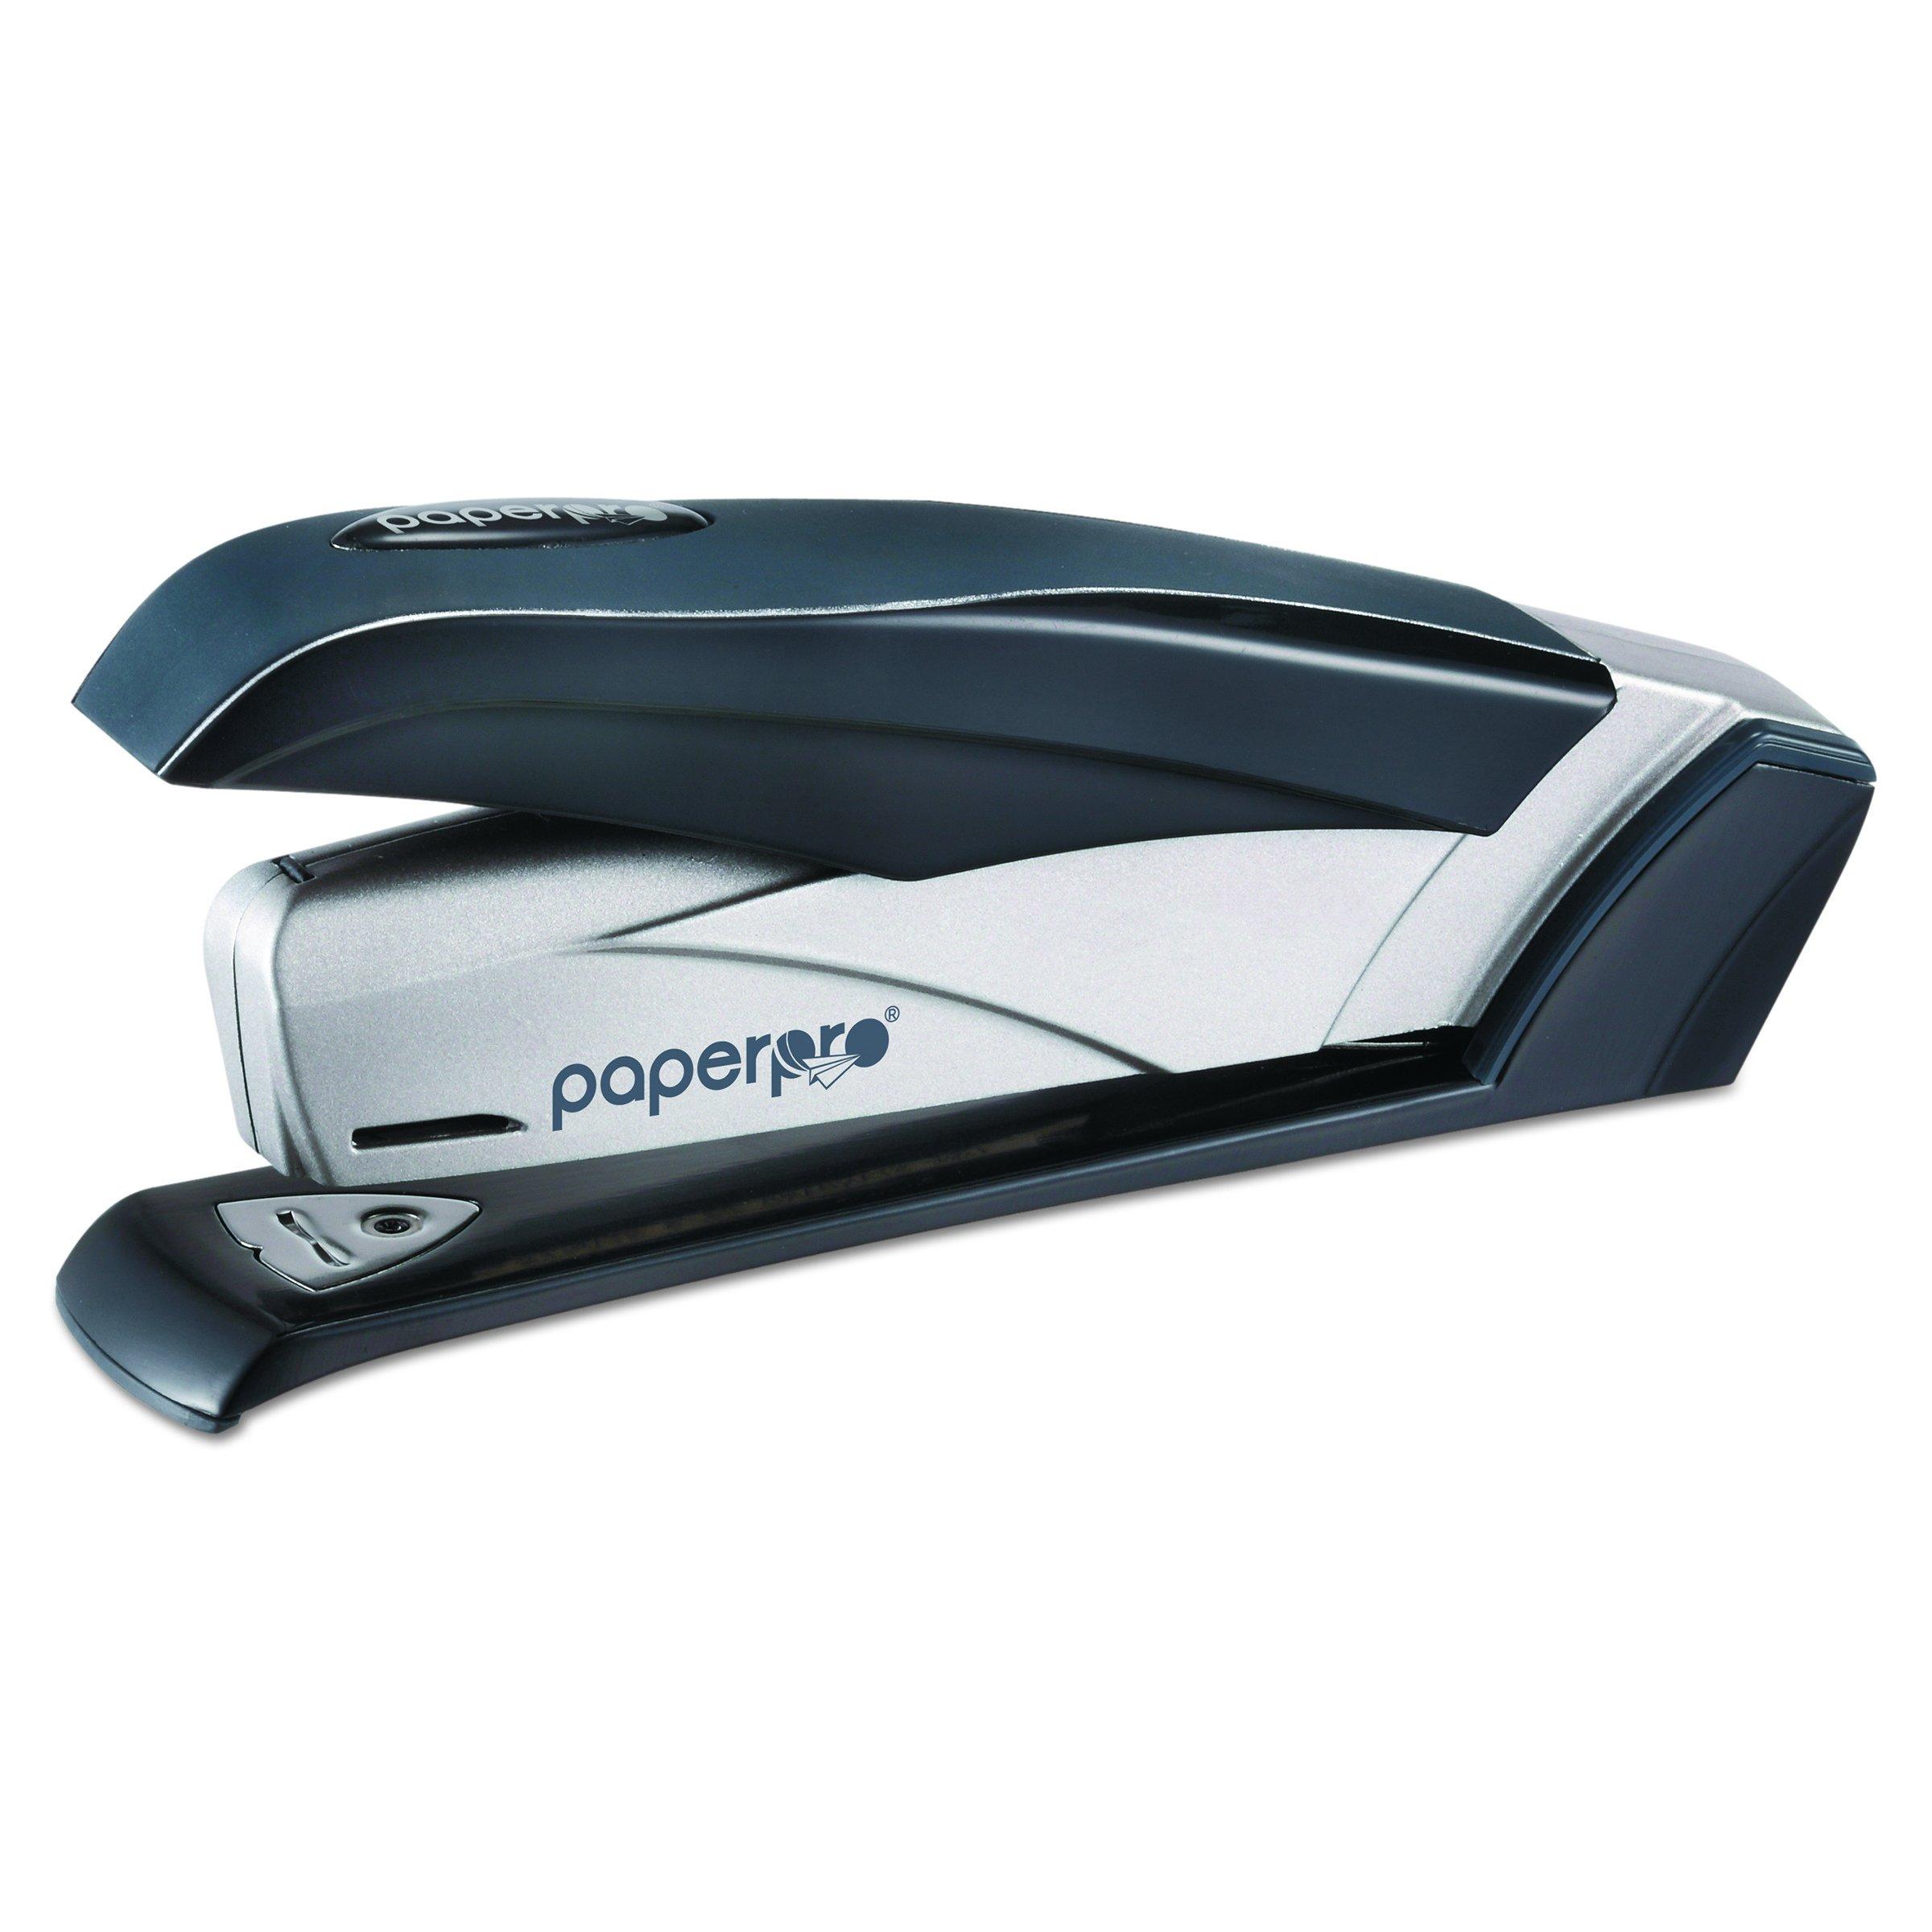 PaperPro inFLUENCE+28 Executive Stapler - One Finger, No Effort, Spring Powered Stapler - Black/Silver (1460)